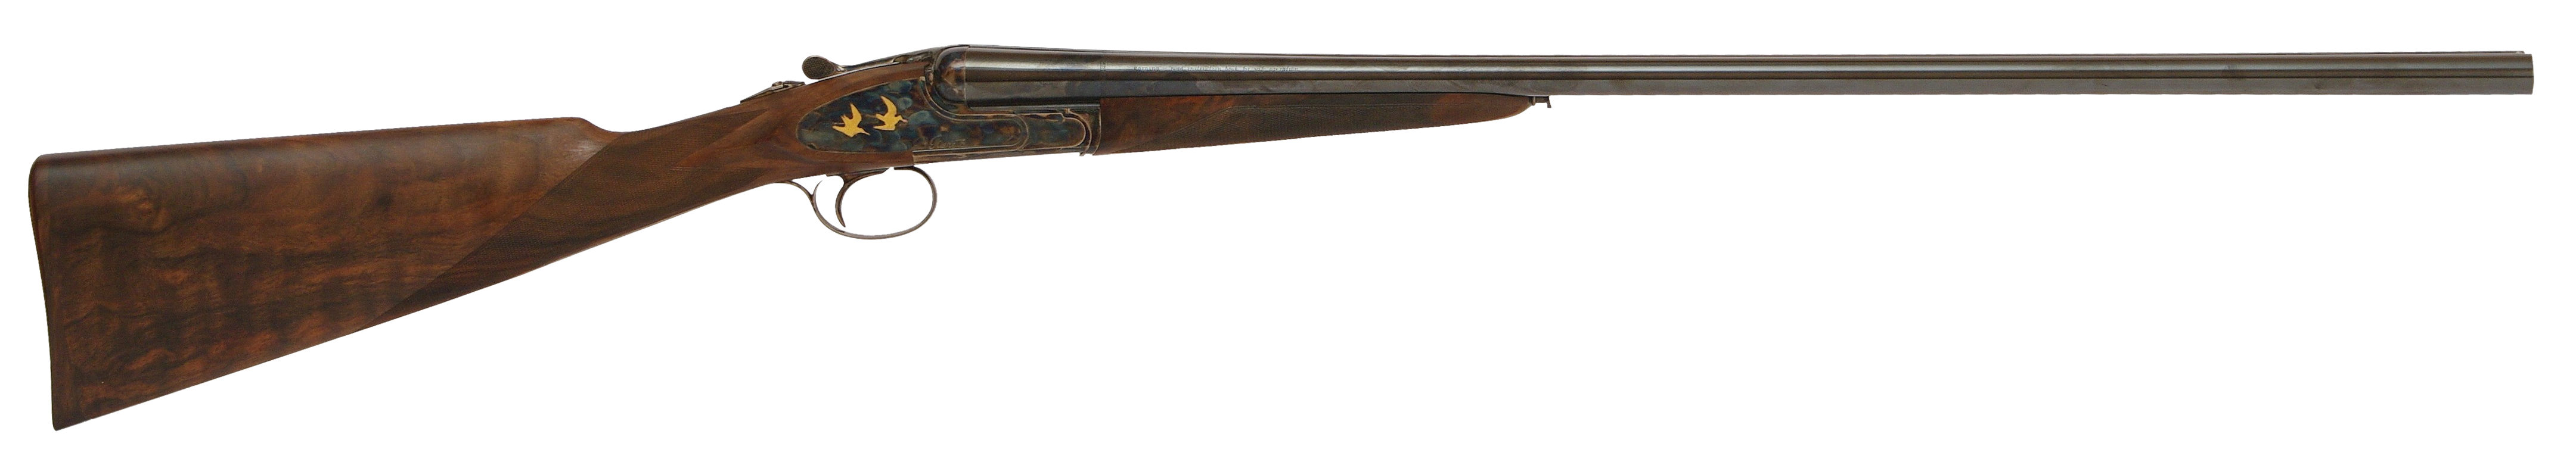 Armurerie 1542640794-beretta-470-silverhawk